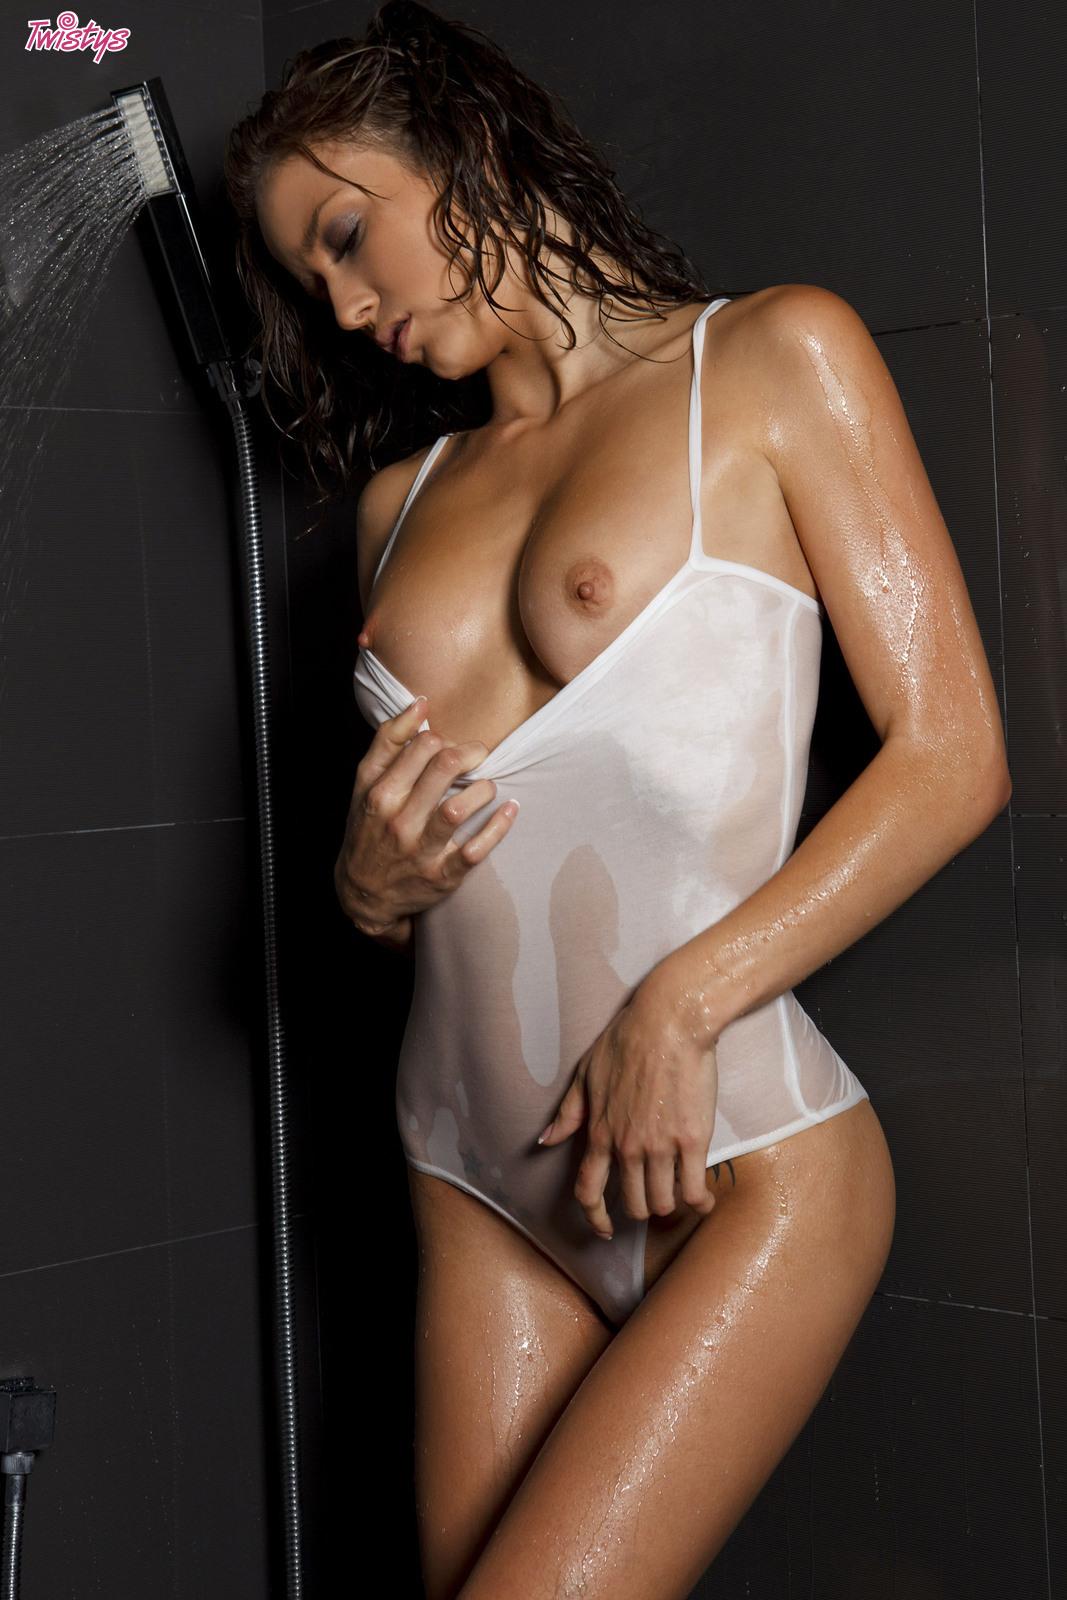 Morgan lesbian shower malena